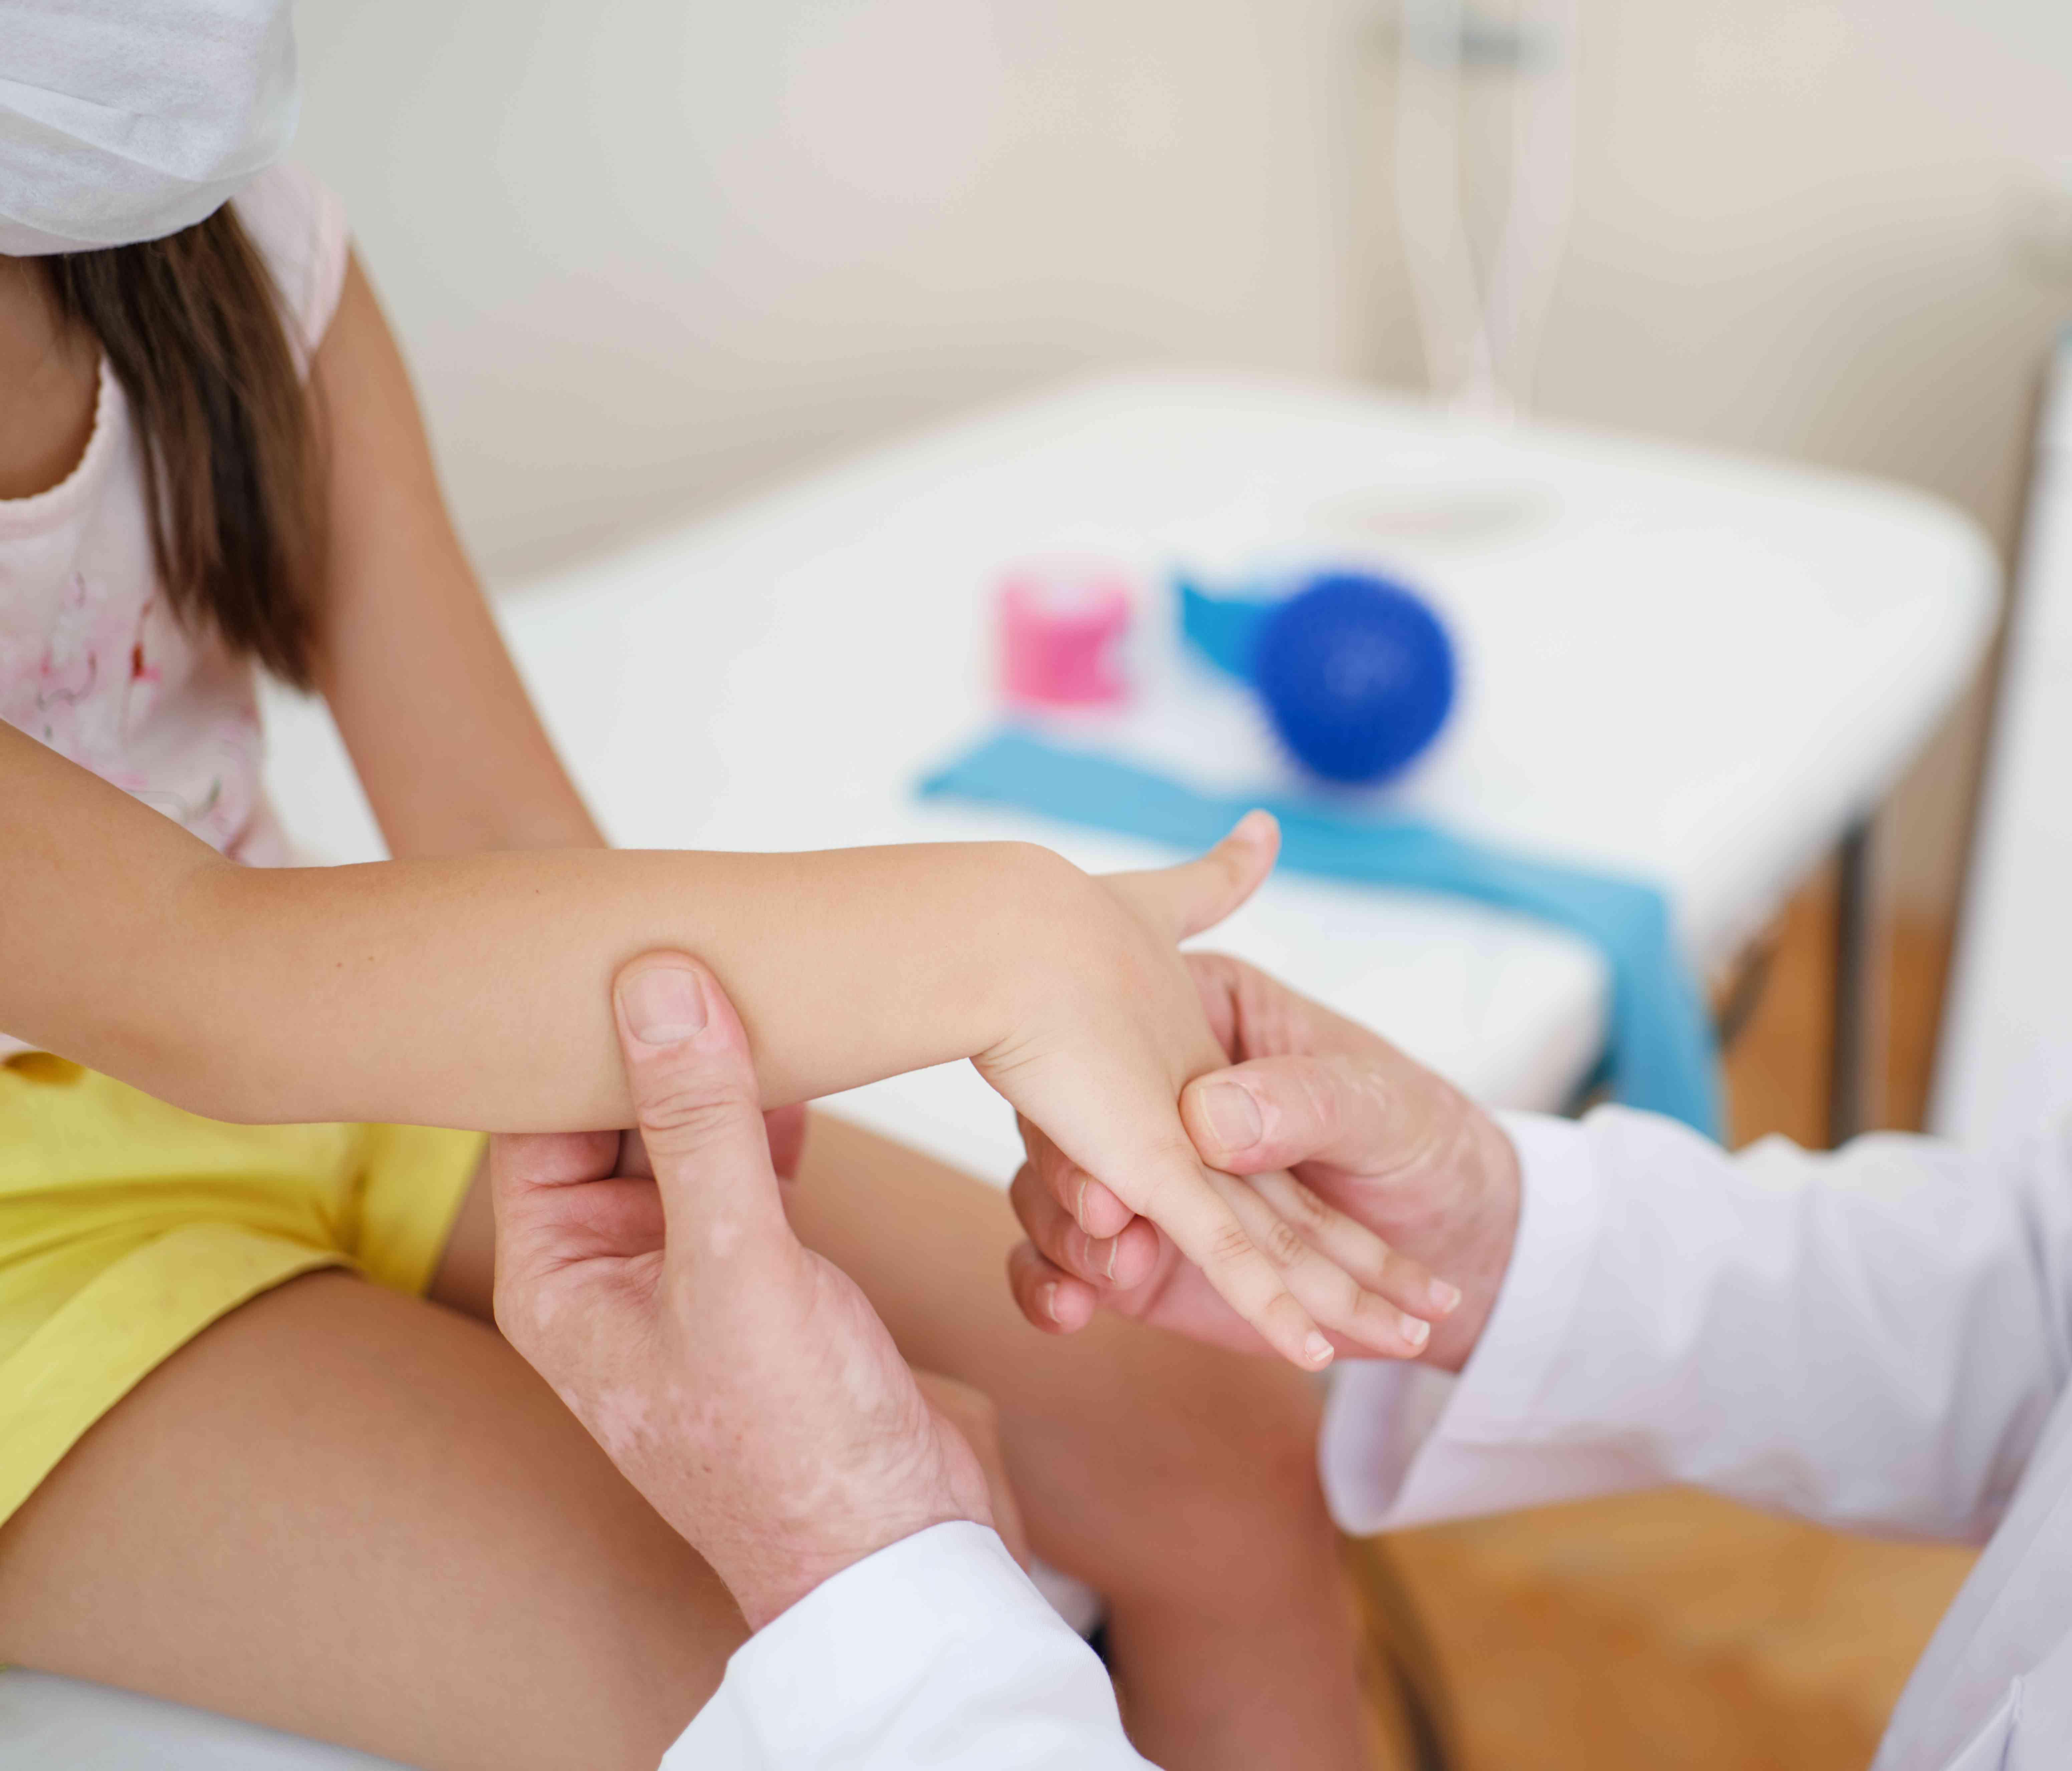 Wrist massage. A male massage therapist puts pressure on a sensitive point on a kid's hand.